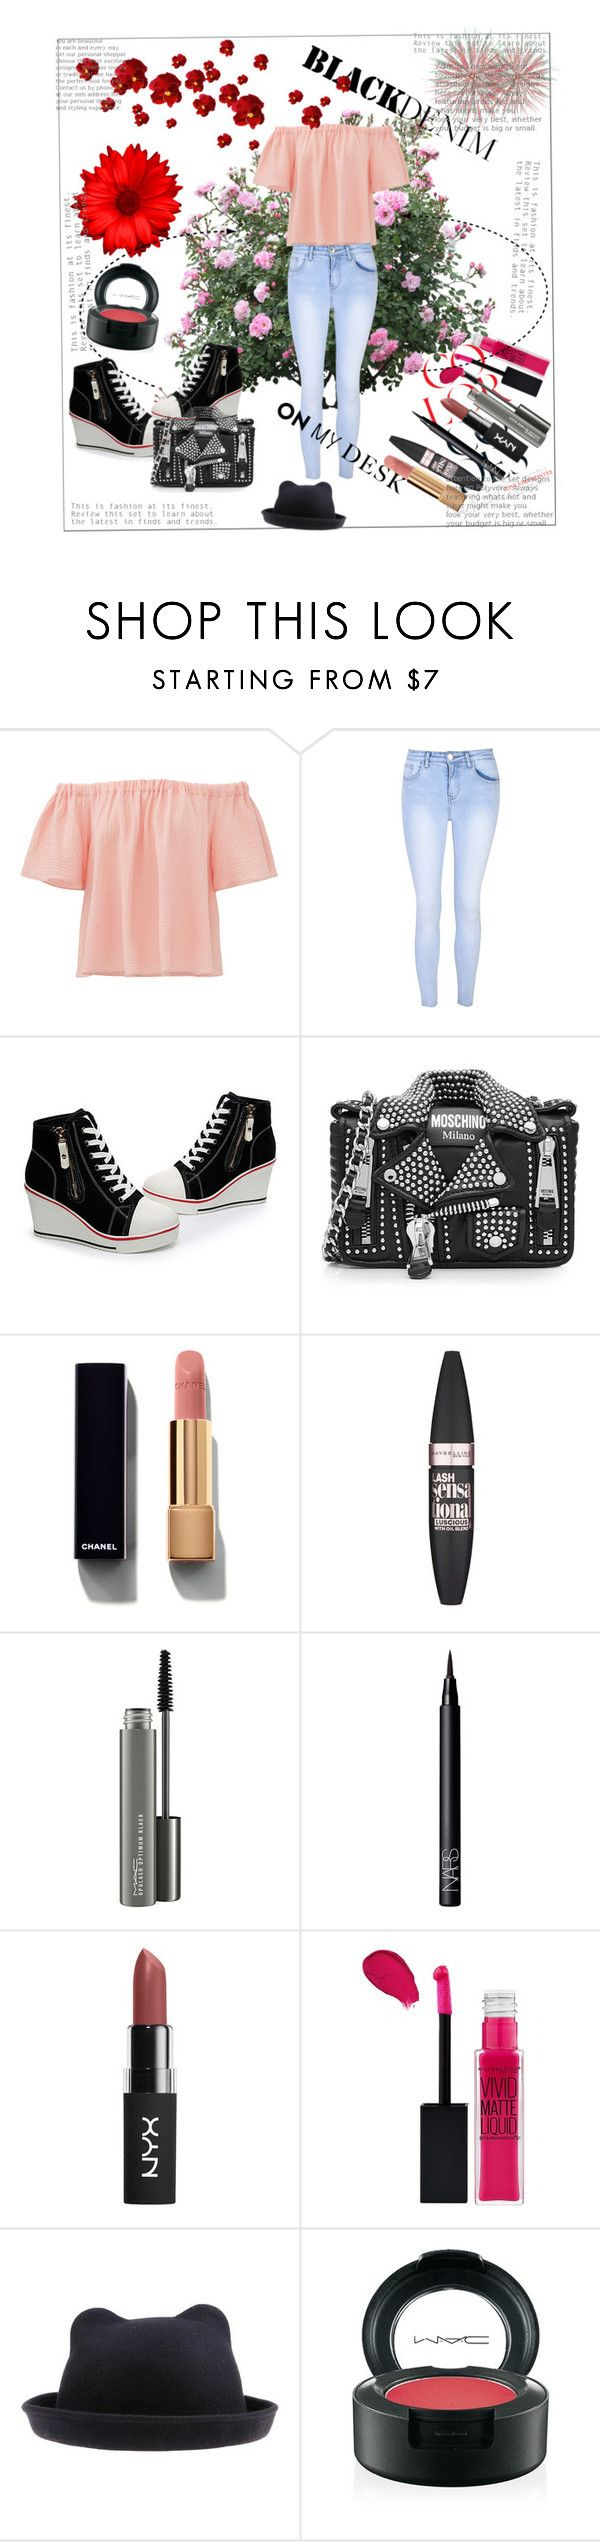 """Весенний стиль"" by simonyulya ❤ liked on Polyvore featuring Rebecca Taylor, Glamorous, Moschino, Chanel, Maybelline, MAC Cosmetics and NARS Cosmetics"